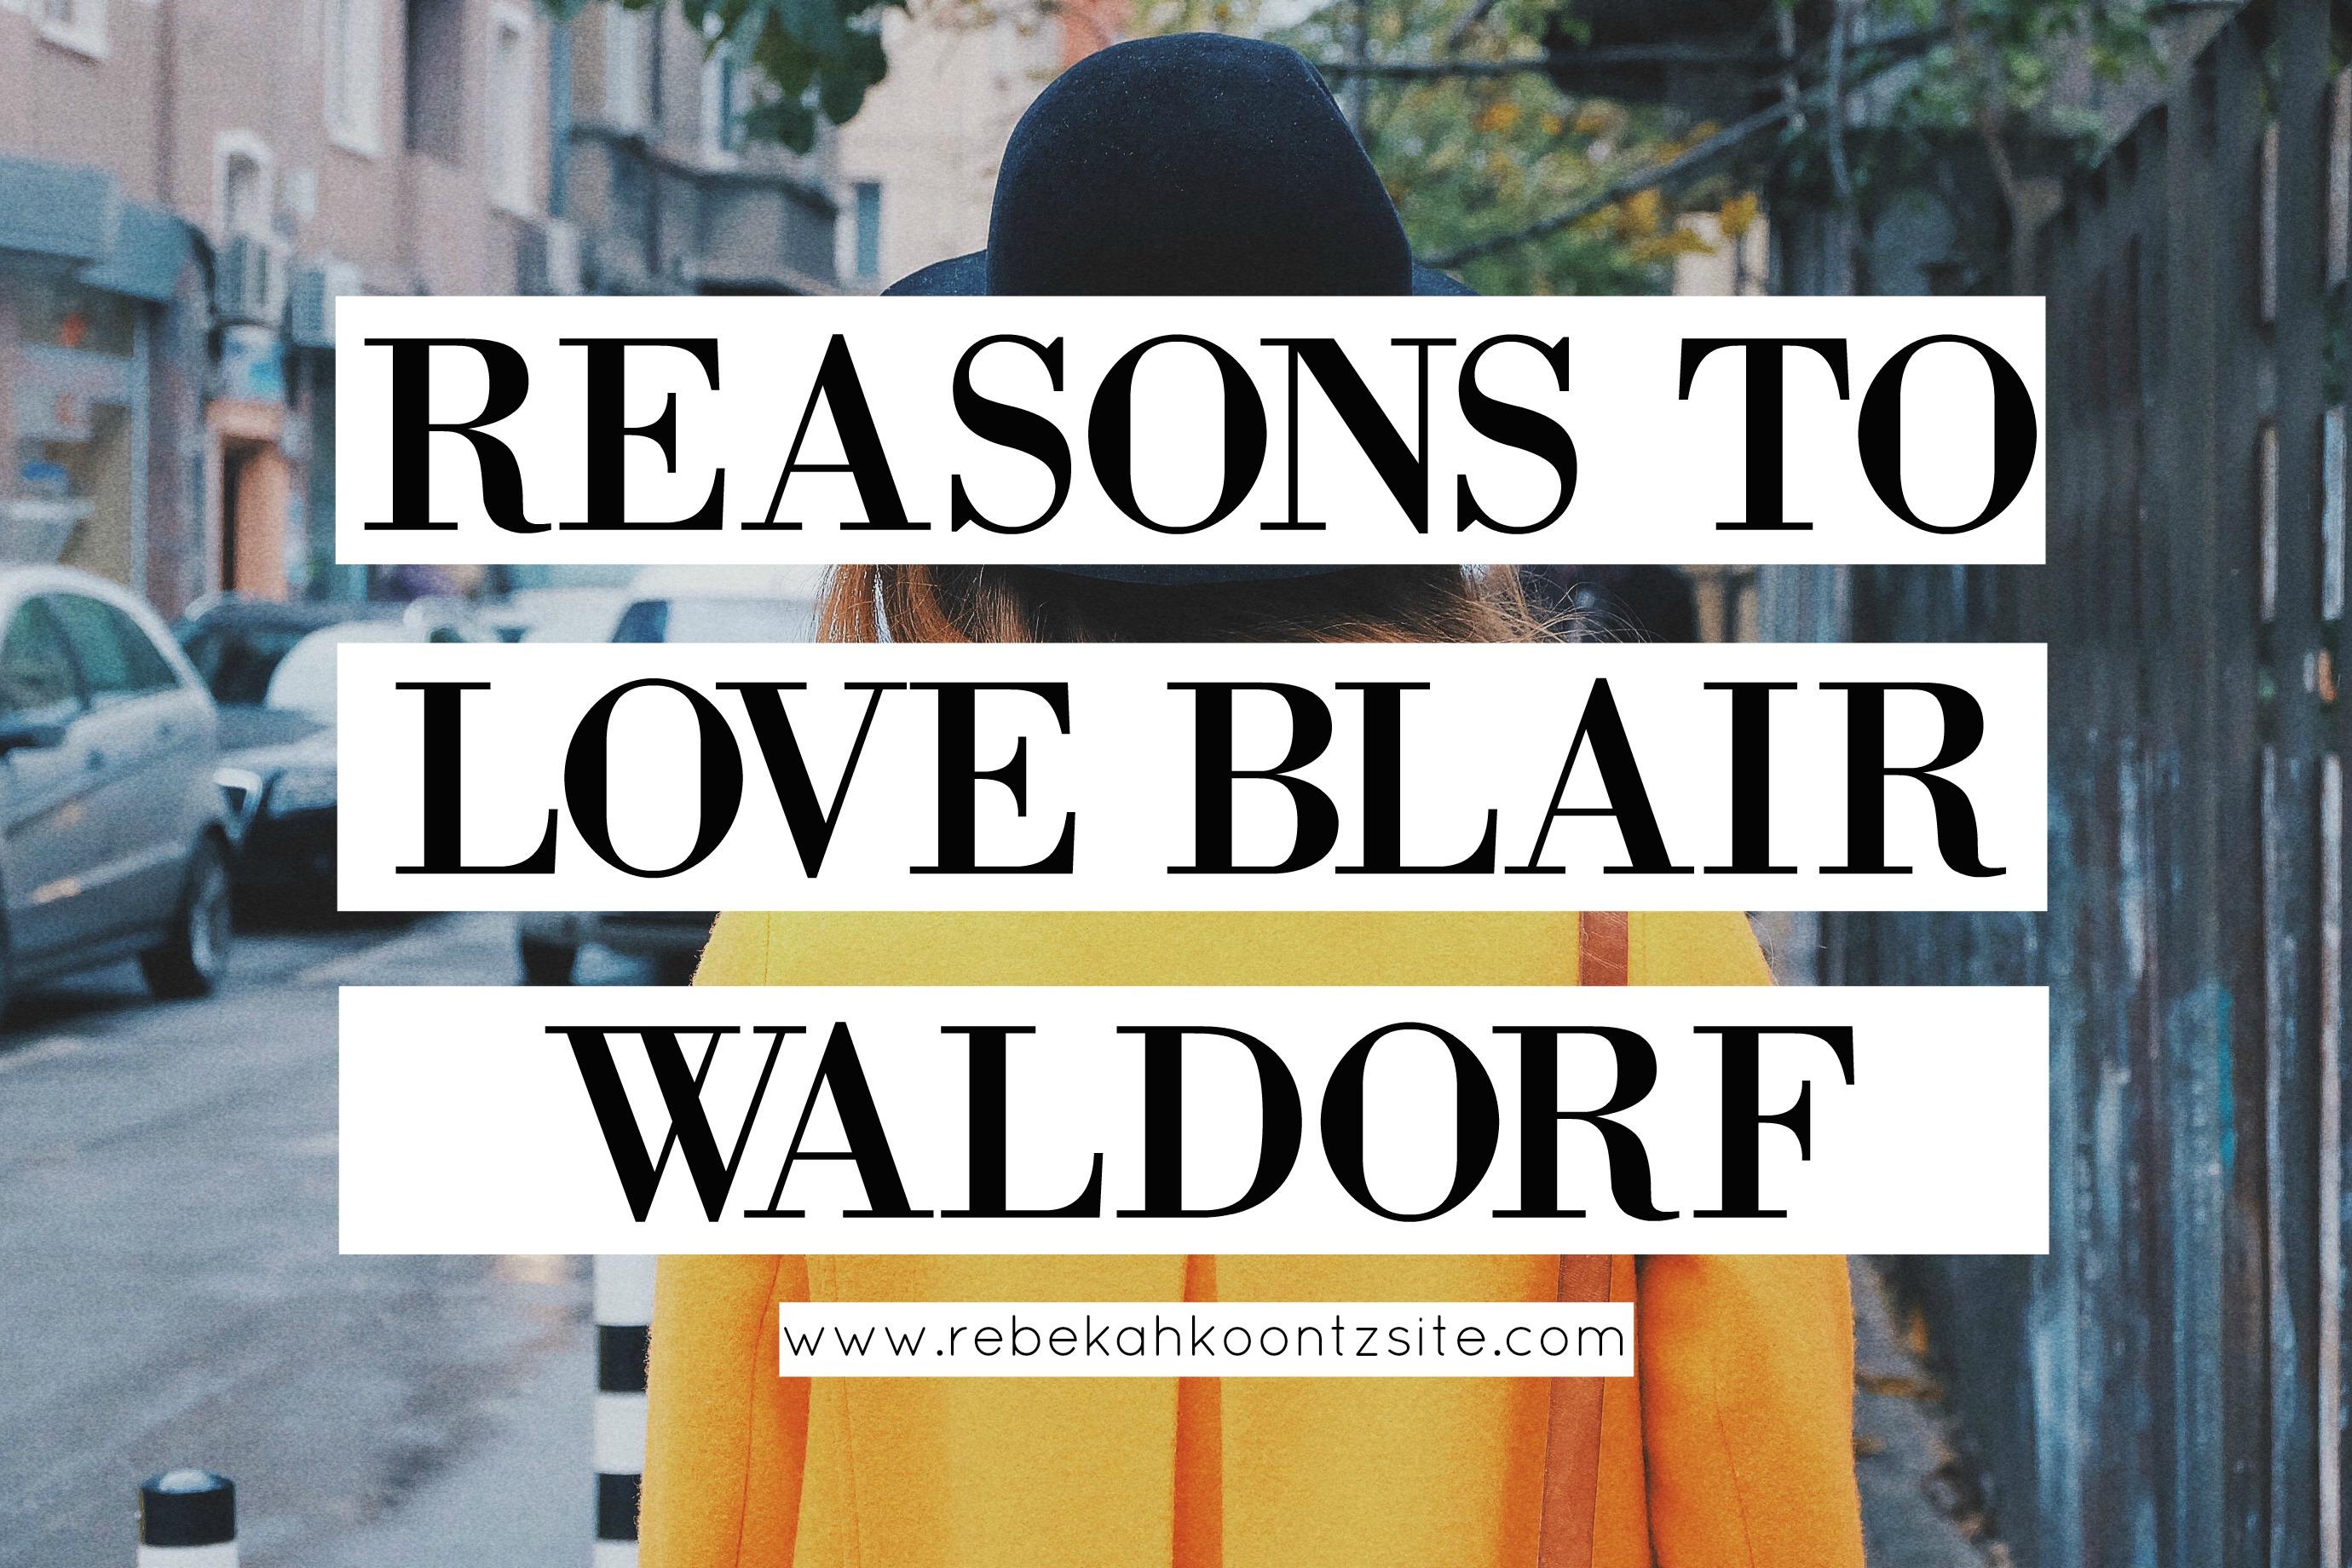 Reasons To Love Blair Waldorf Rebekah Koontz lifestyle blogger gossip girl fangirl fan what would blair waldorf do